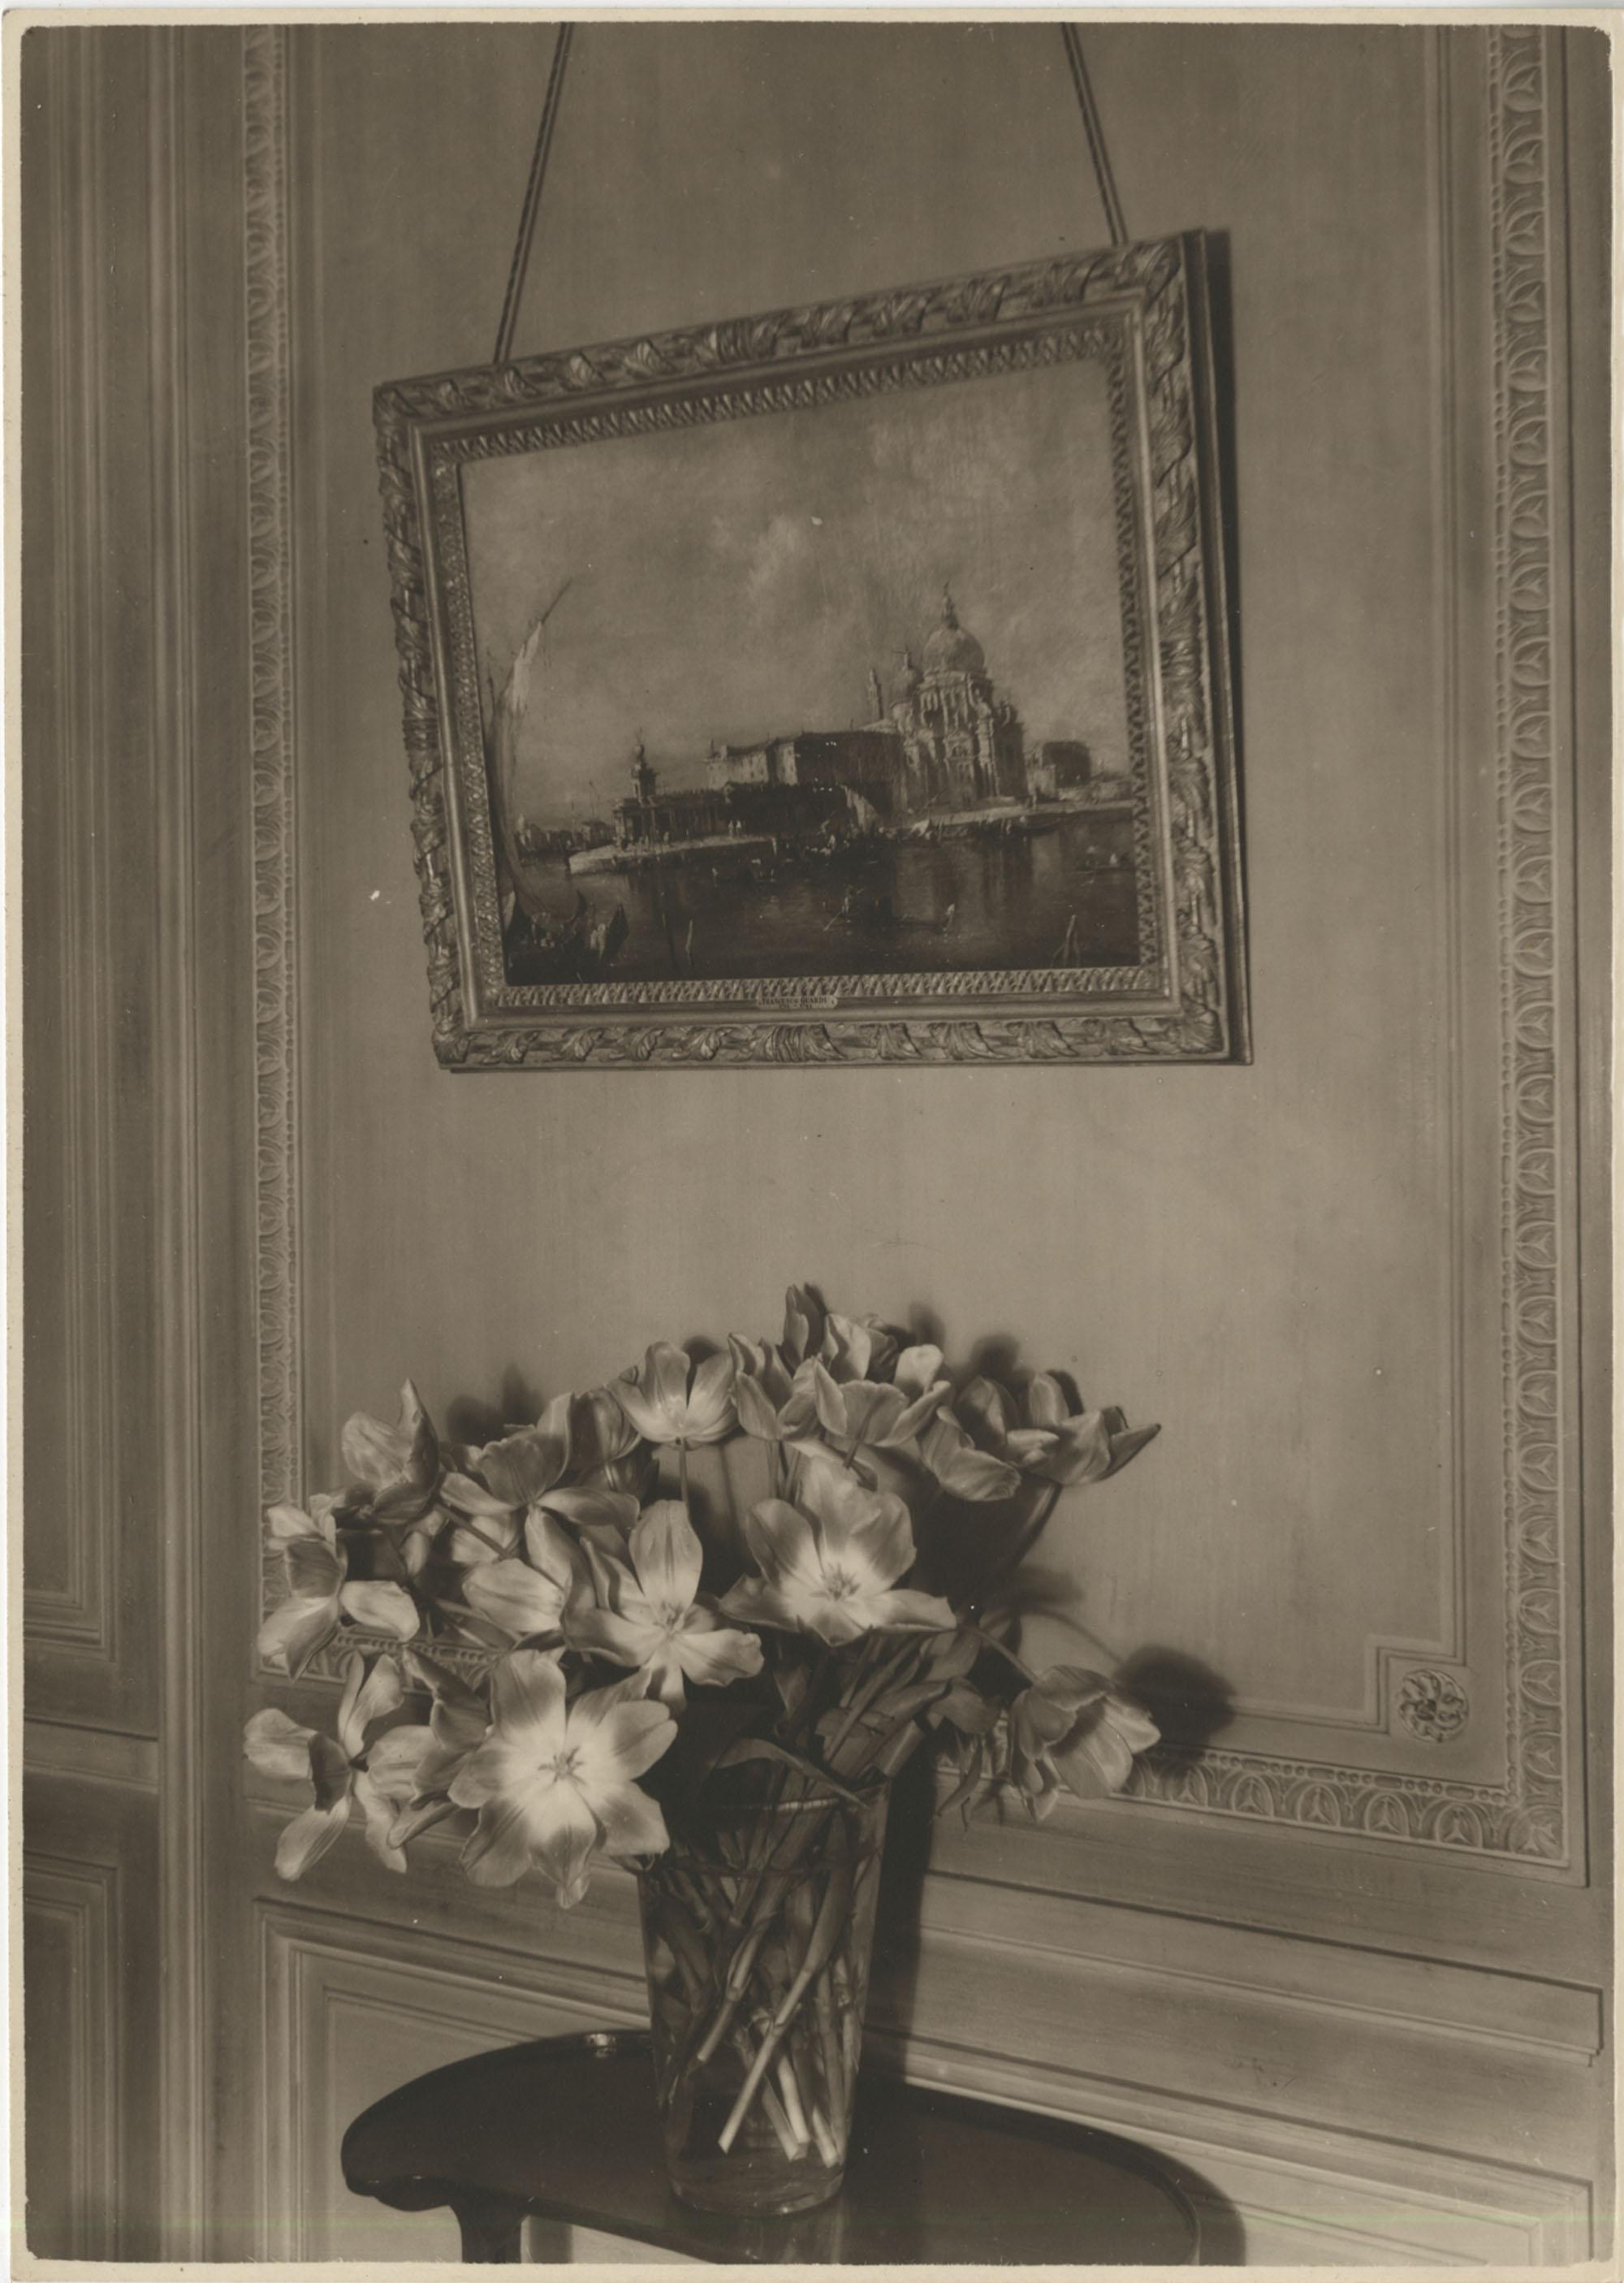 Interior of the Royal Italian Consul in Sri Lanka, Photograph 35